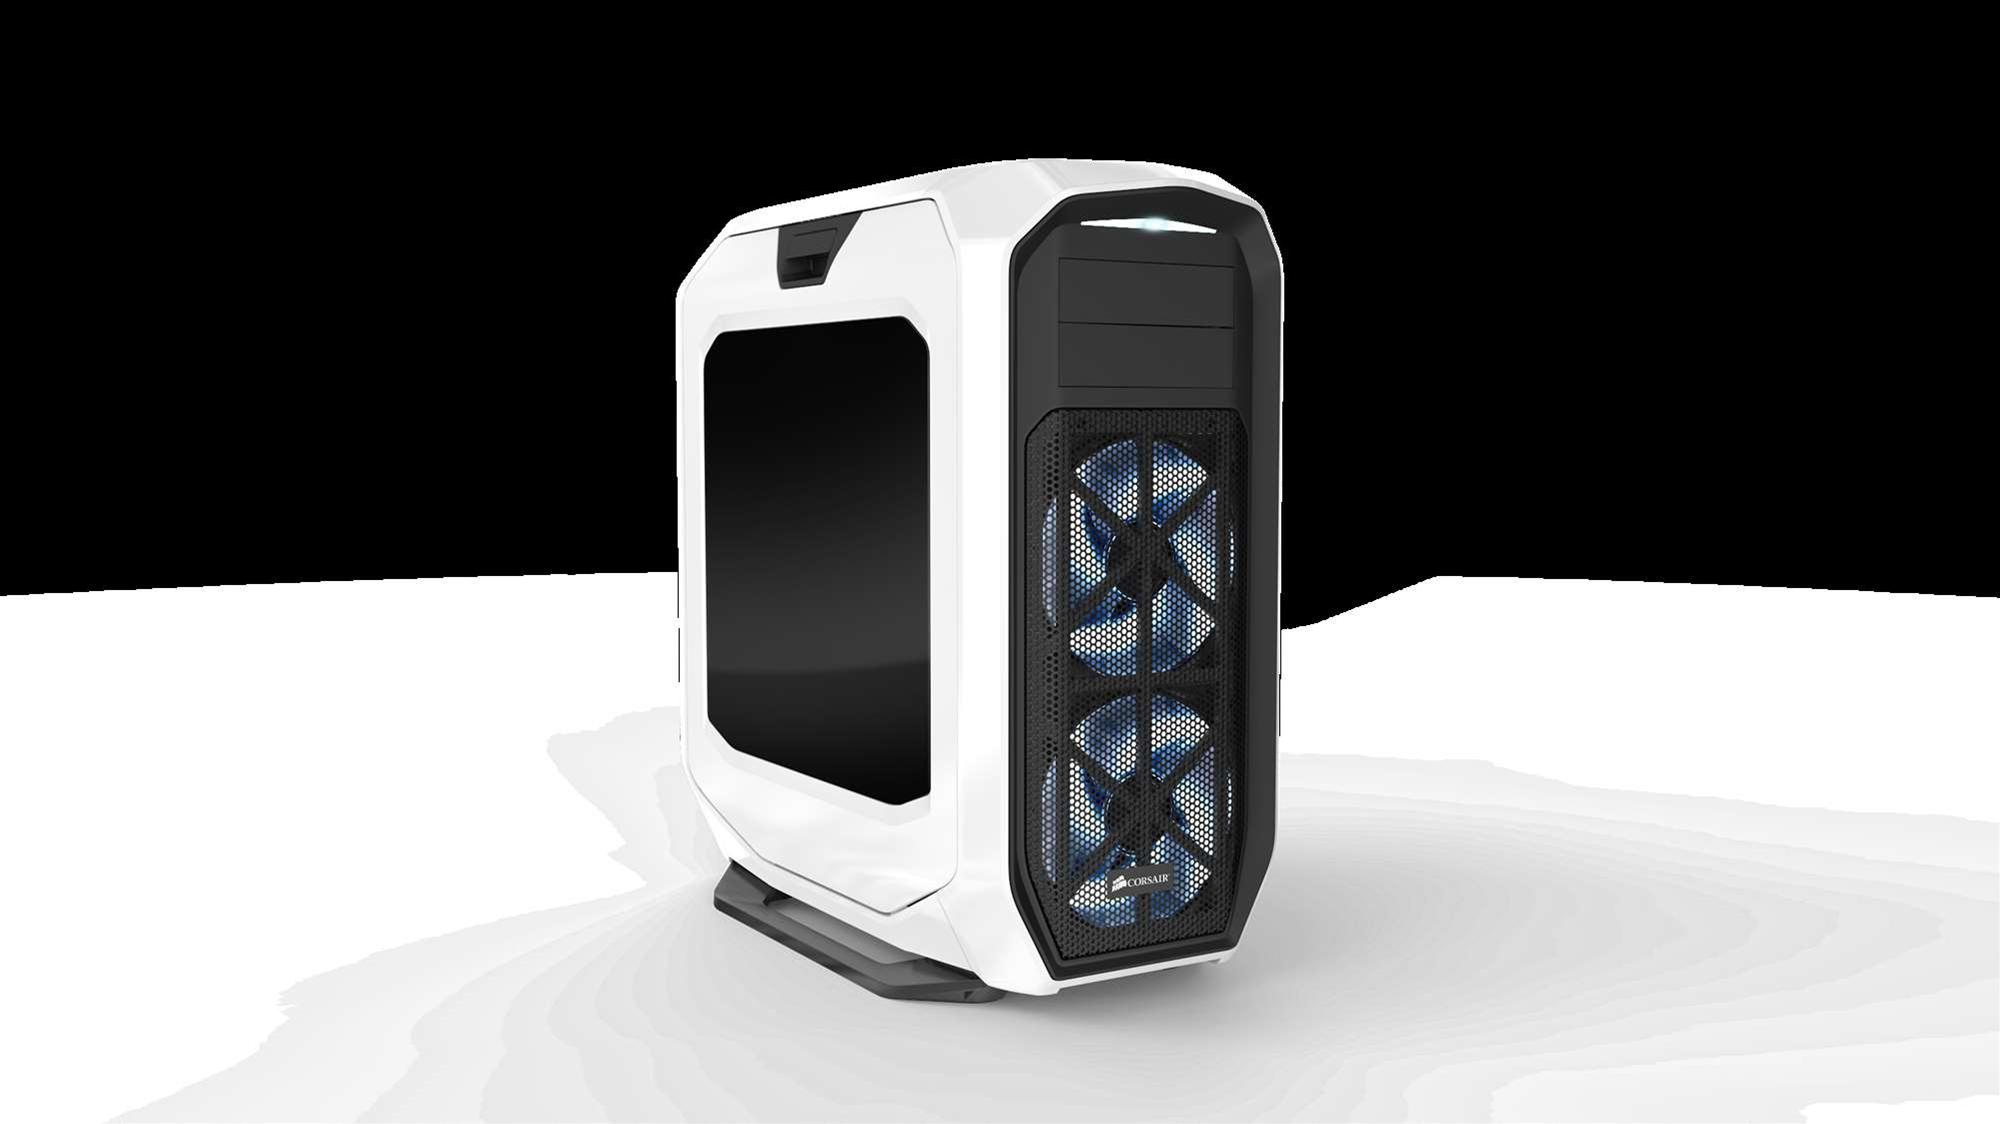 Corsair's big Computex 2014 hardware reveal